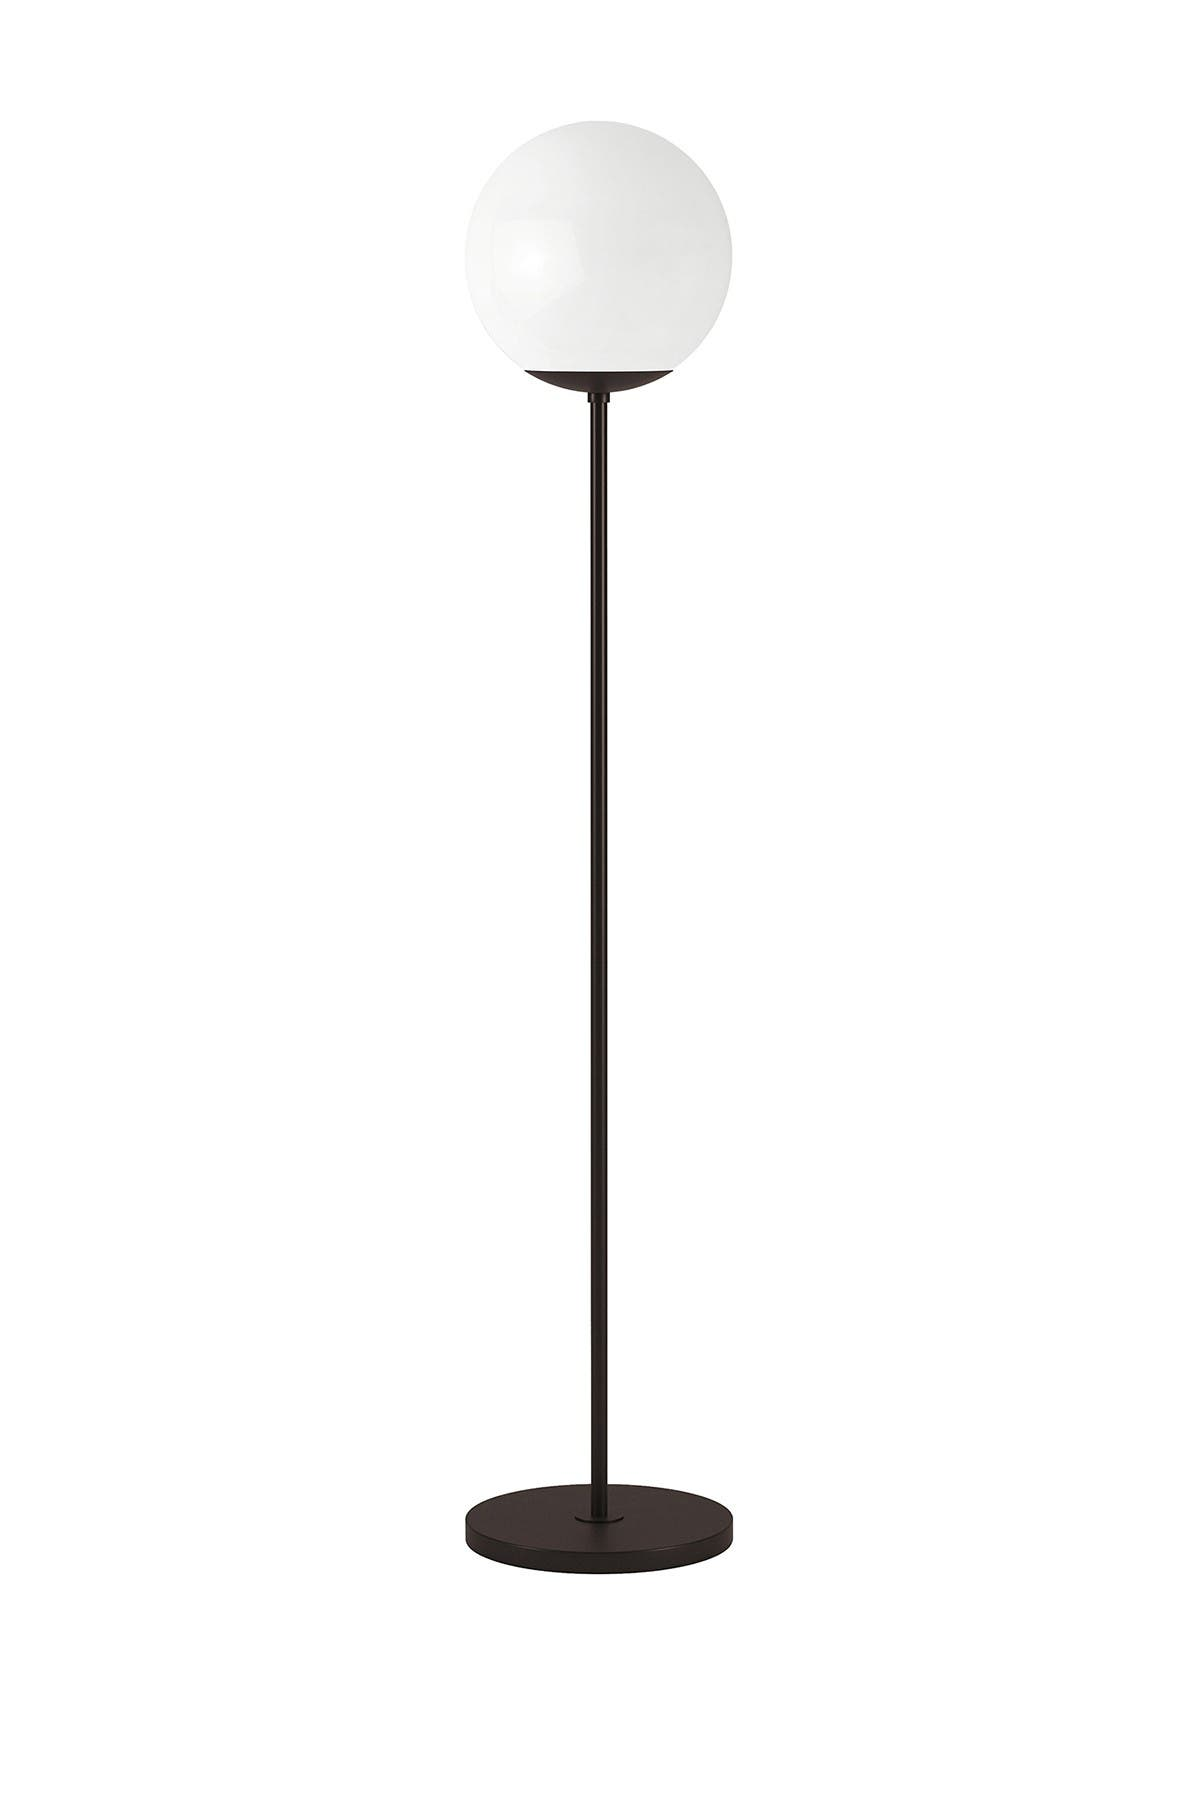 Image of Addison and Lane Theia Globe & Stem Floor Lamp - Blackened Bronze